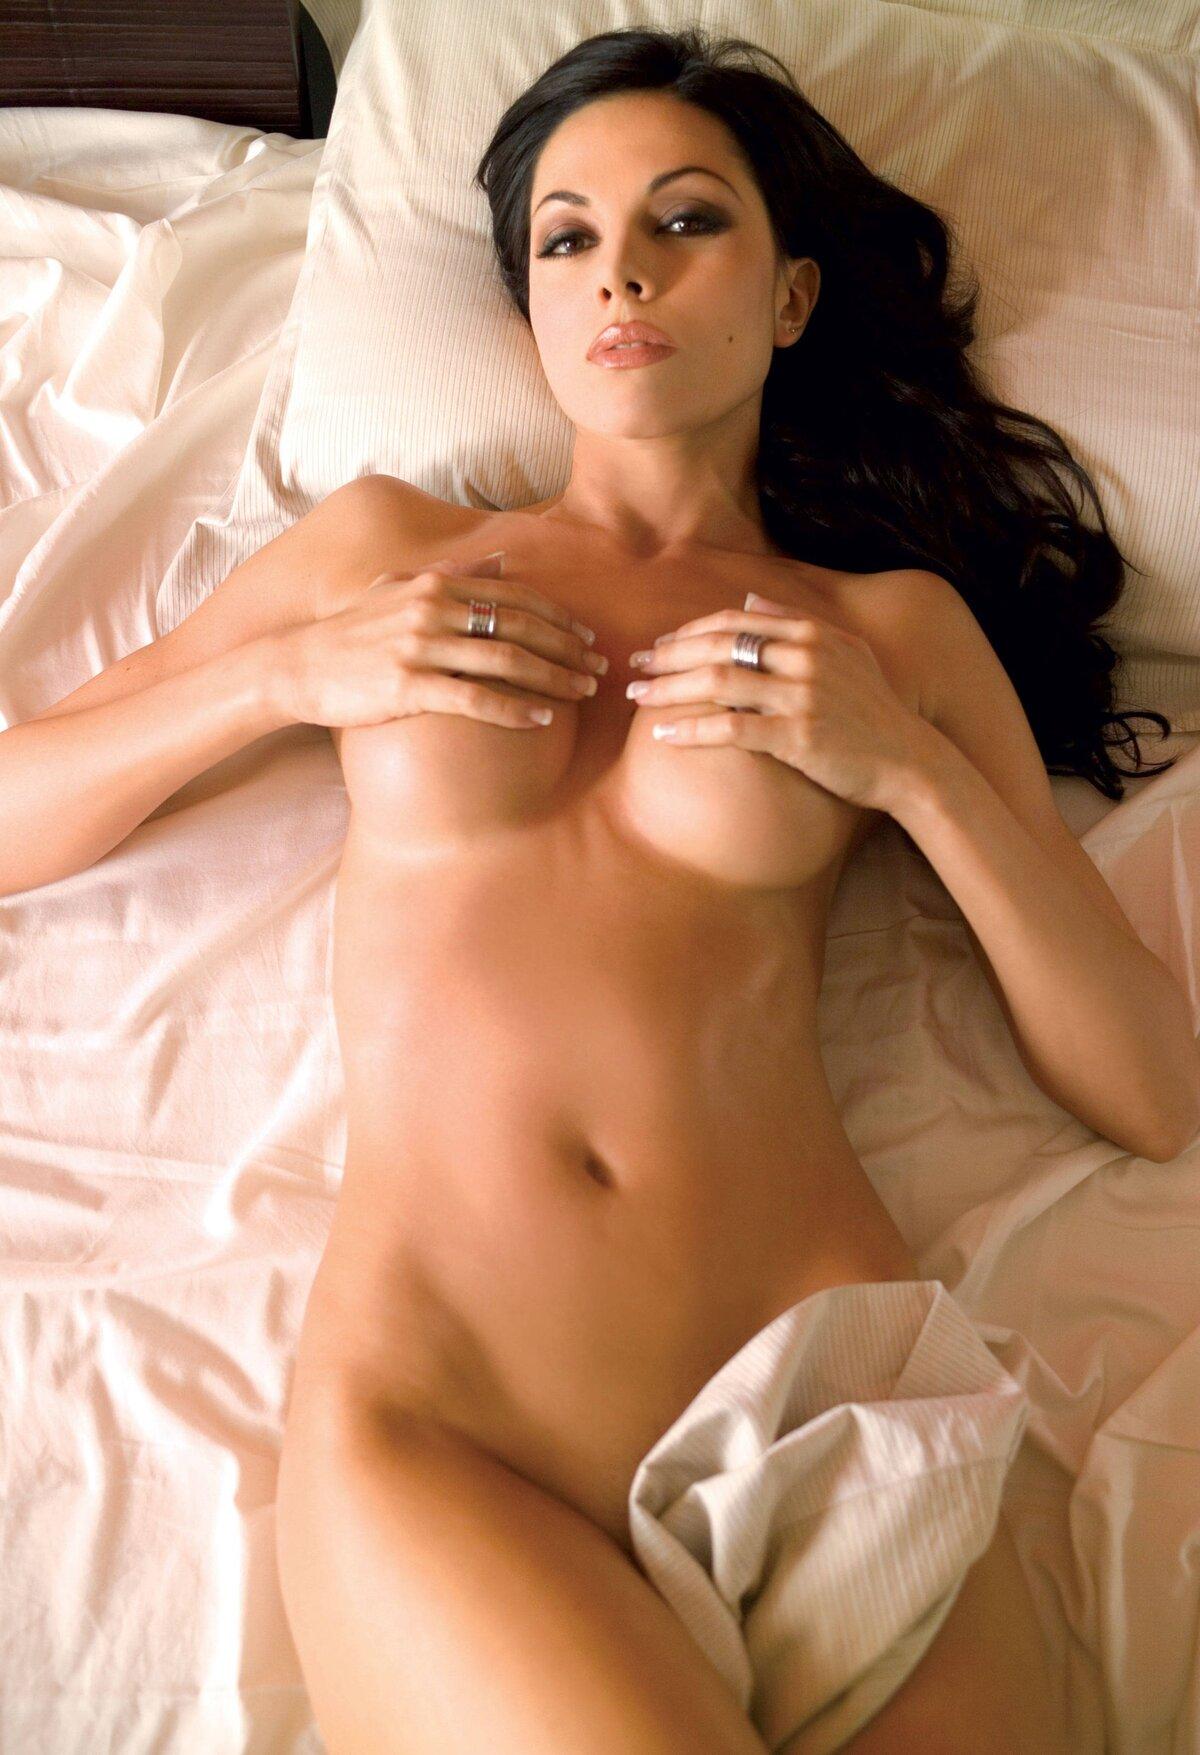 francesca-osorio-nude-pics